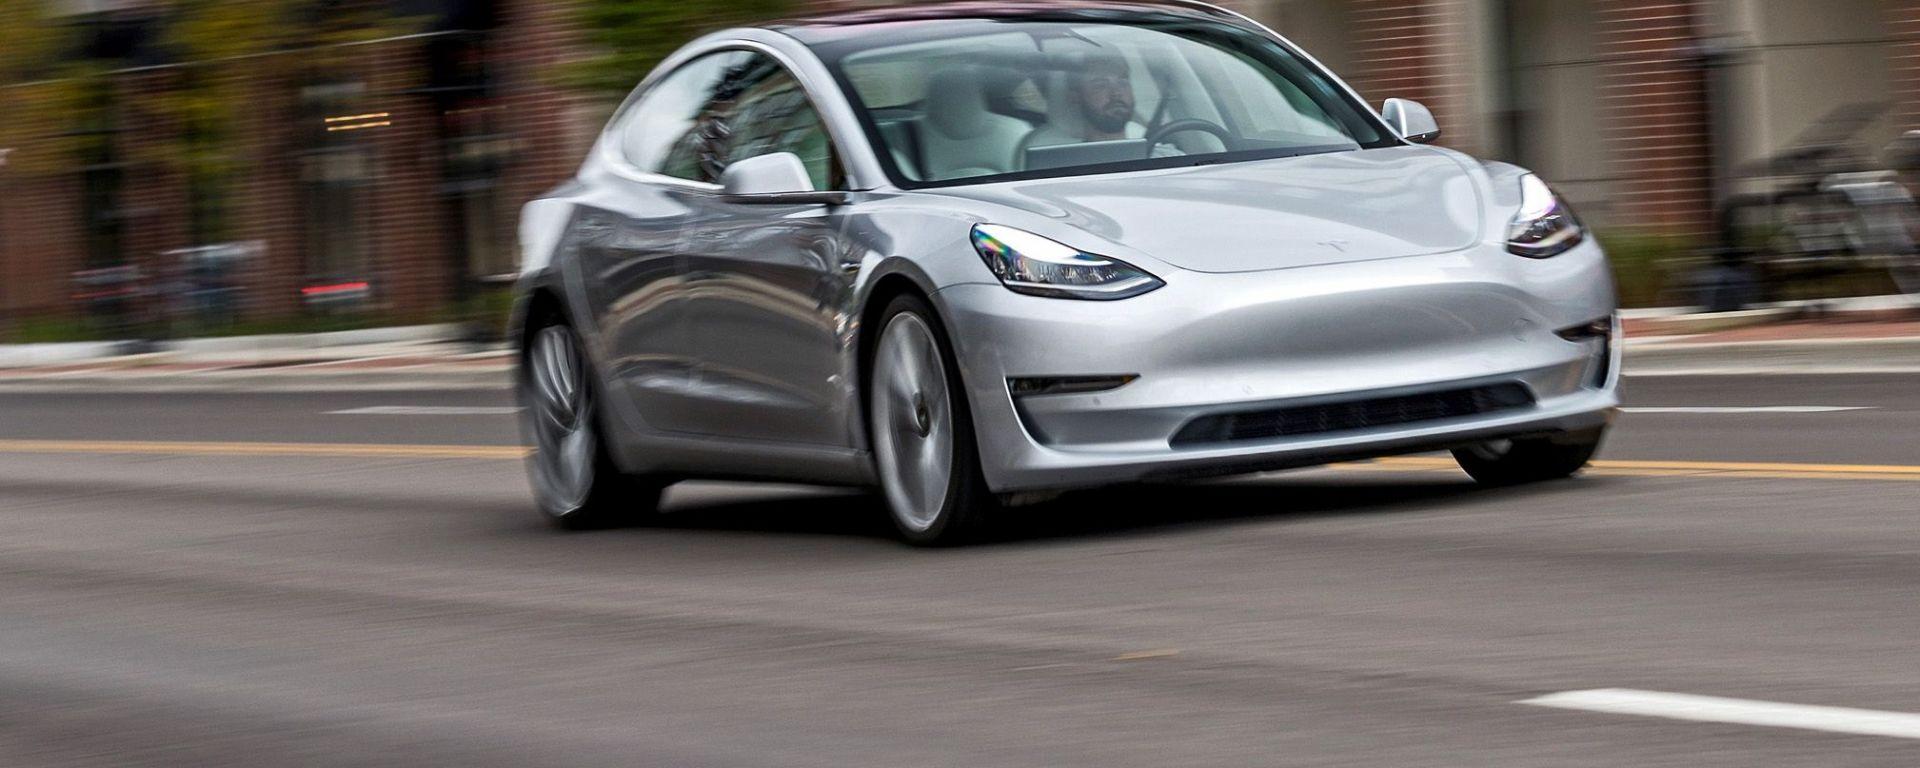 Da Tesla Model 3 a Mercedes EQC, 10 elettriche in arrivo nel 2019